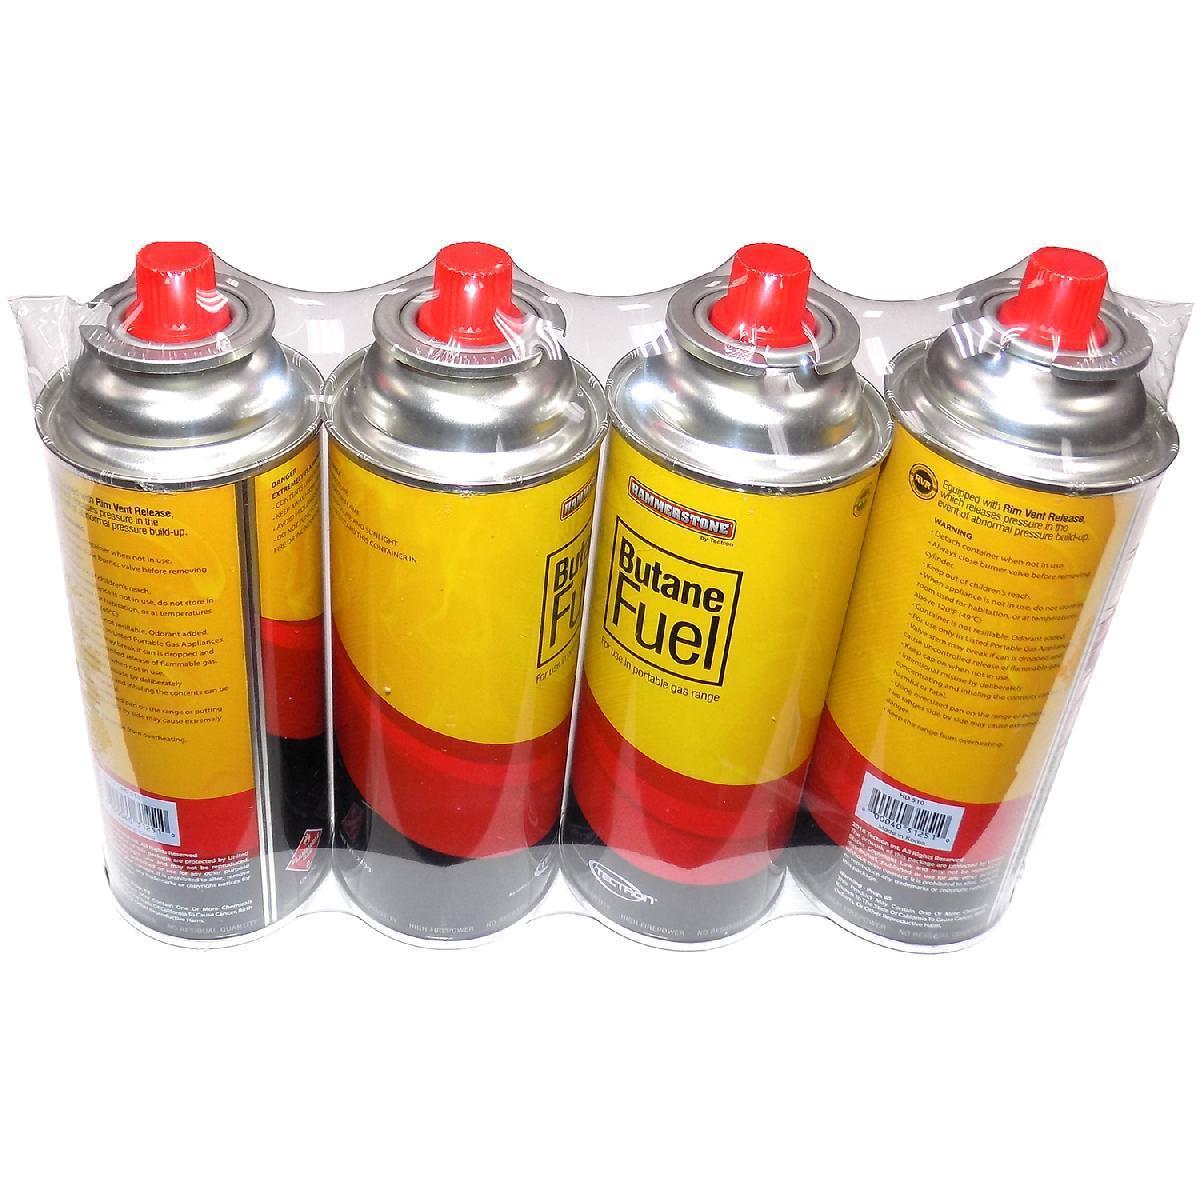 4-28Pk Portable Butane Fuel Gas Range Canister Can Cartridges Stove Burners